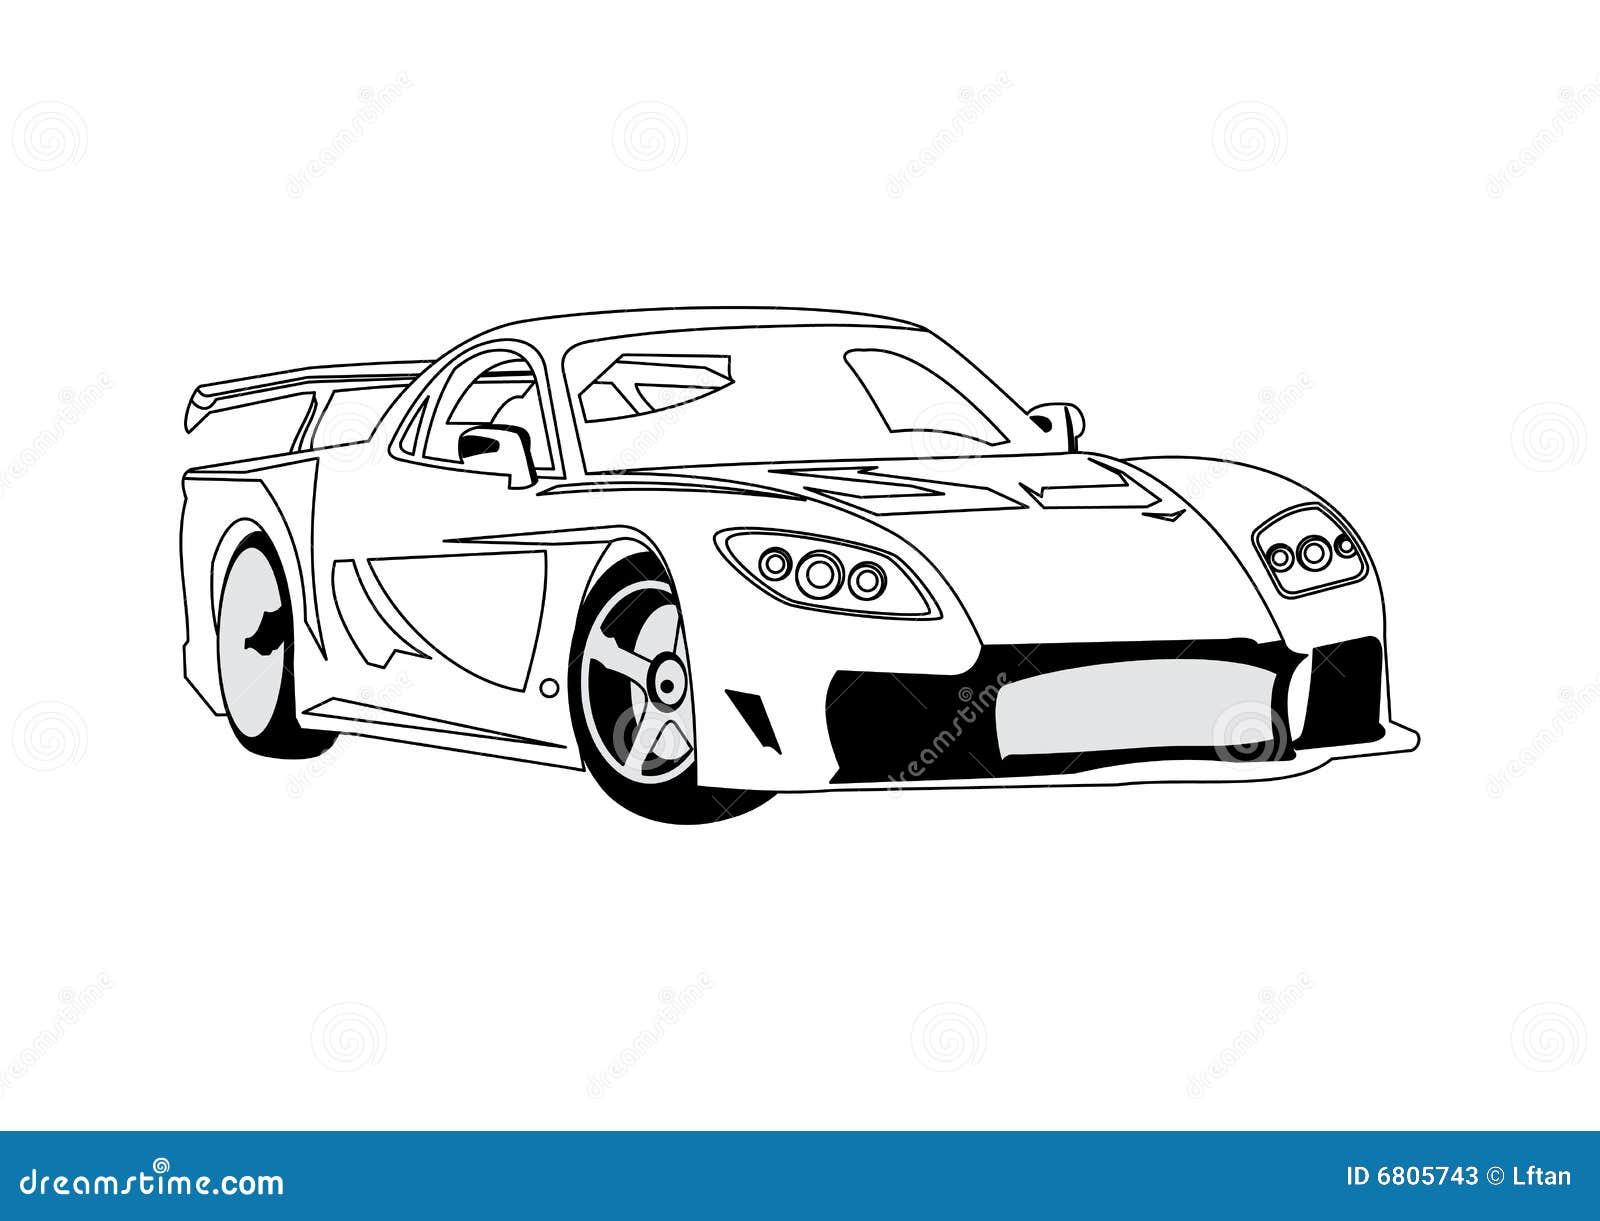 Line art car : Car line art stock photos image